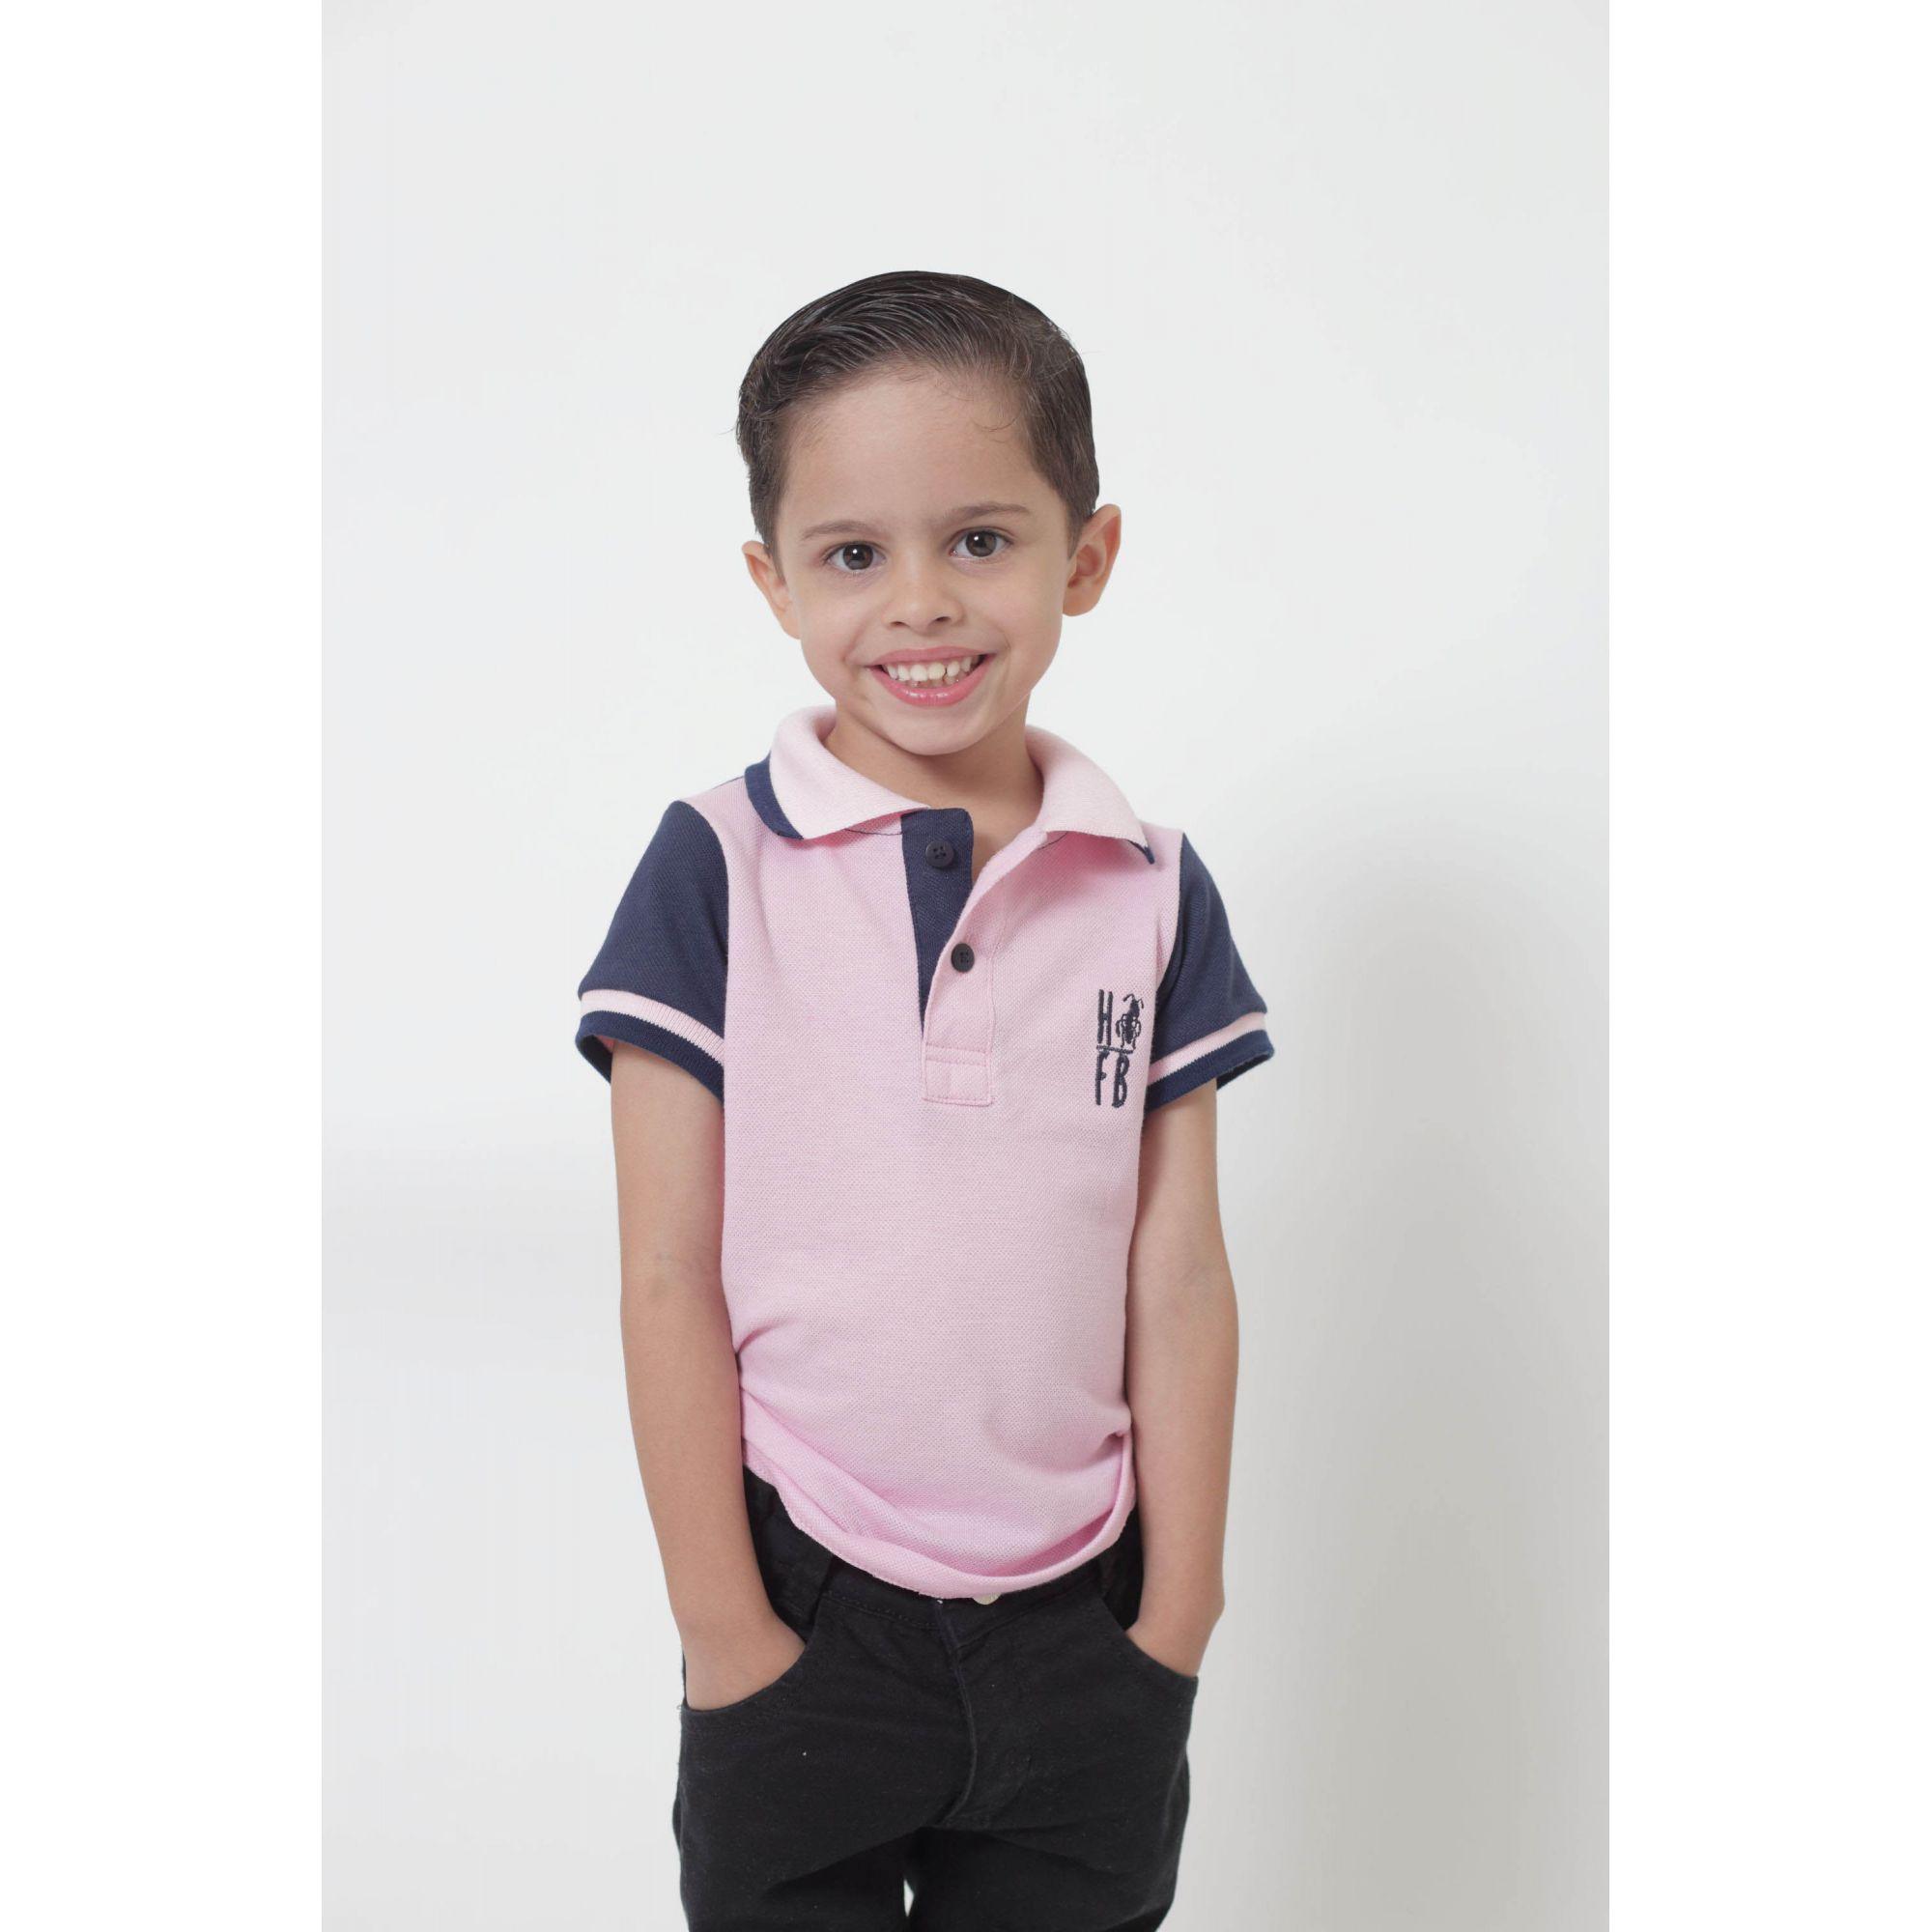 Camisa ou Body Polo Infantil Dual Cor Rosa e Marinho  - Heitor Fashion Brazil